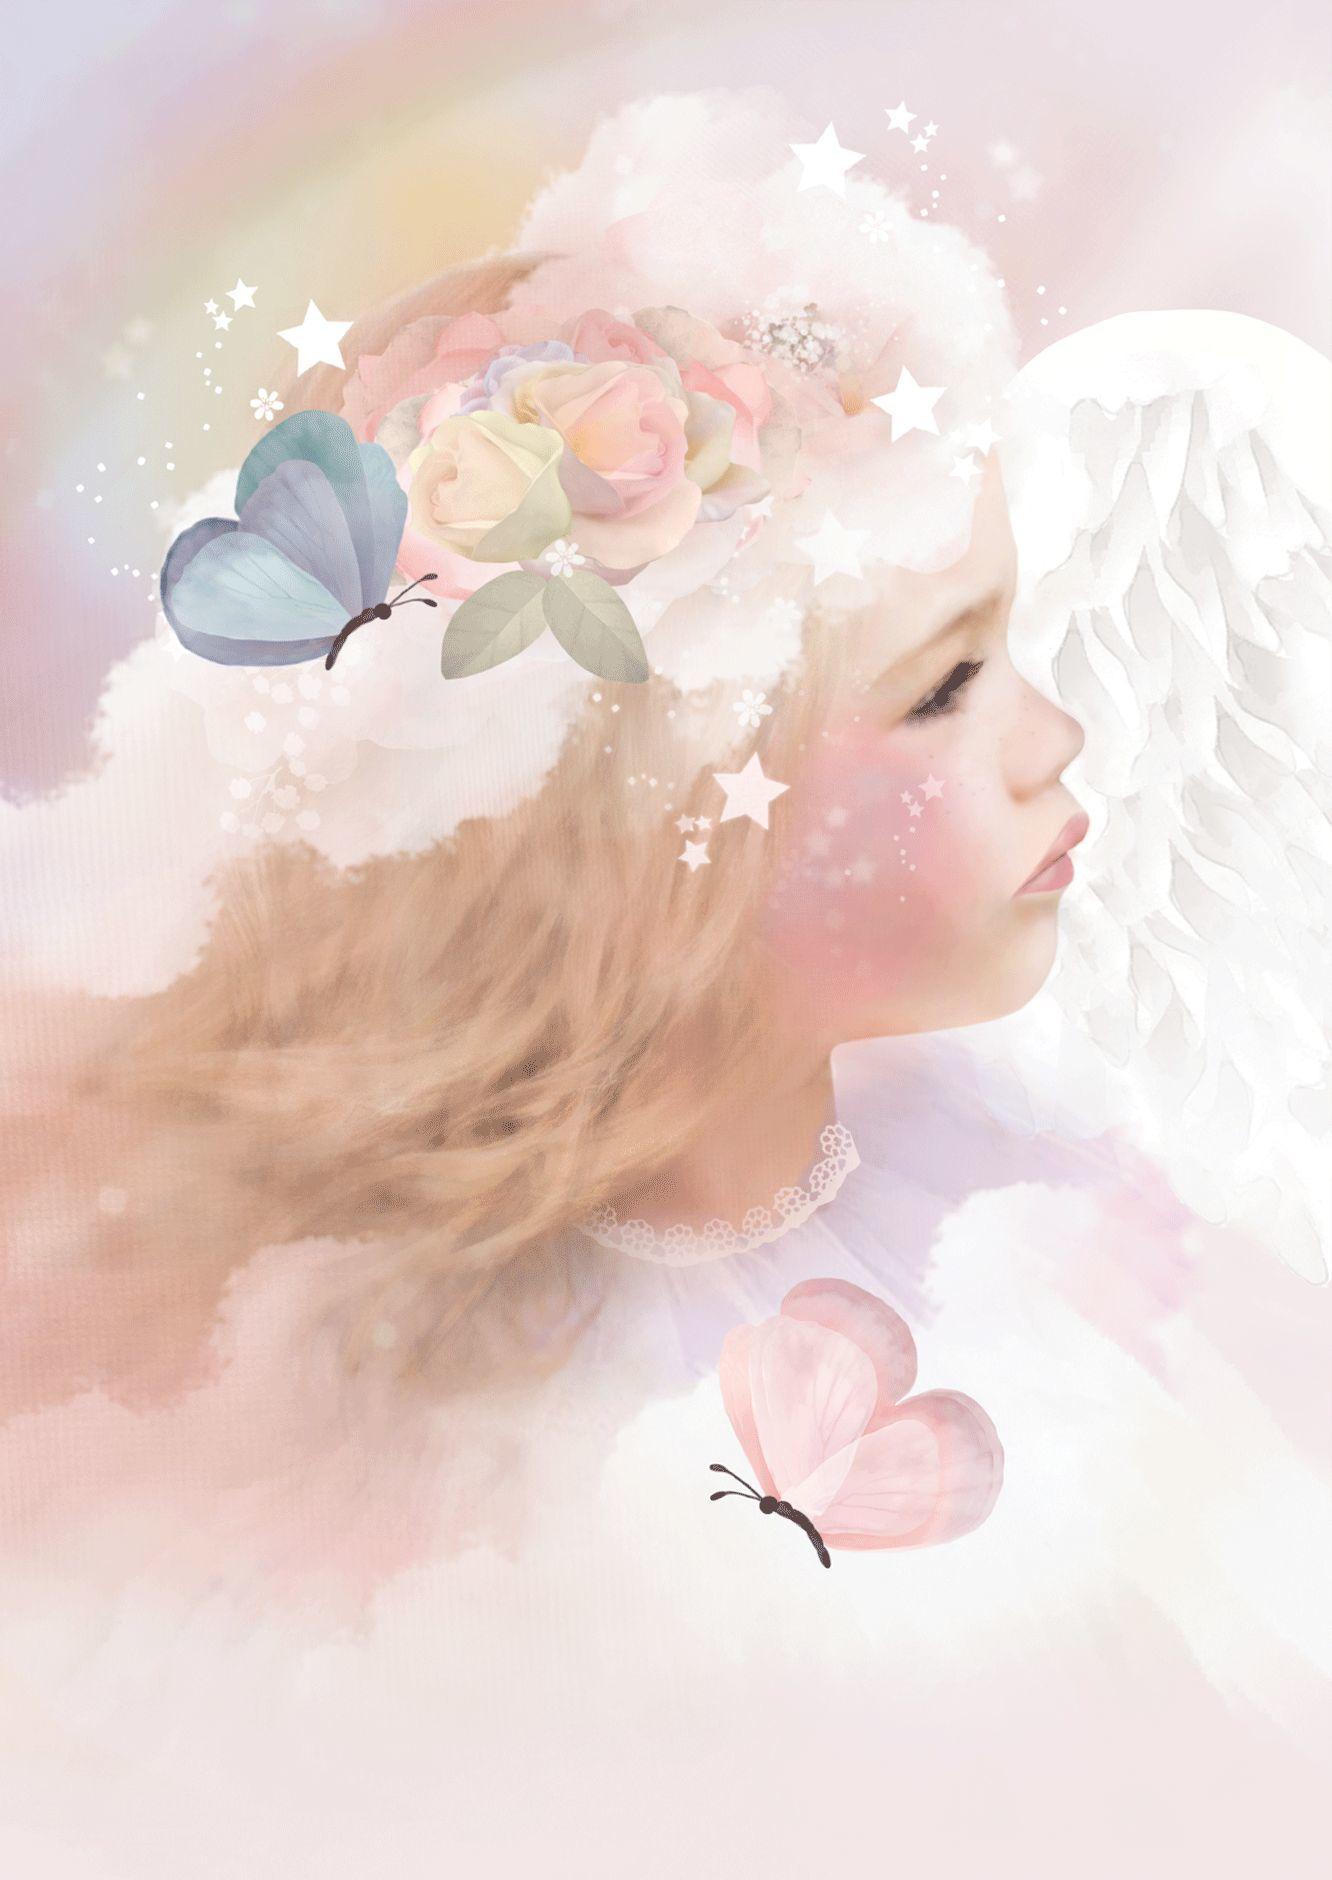 Schmooks Juliste Lullaby Love